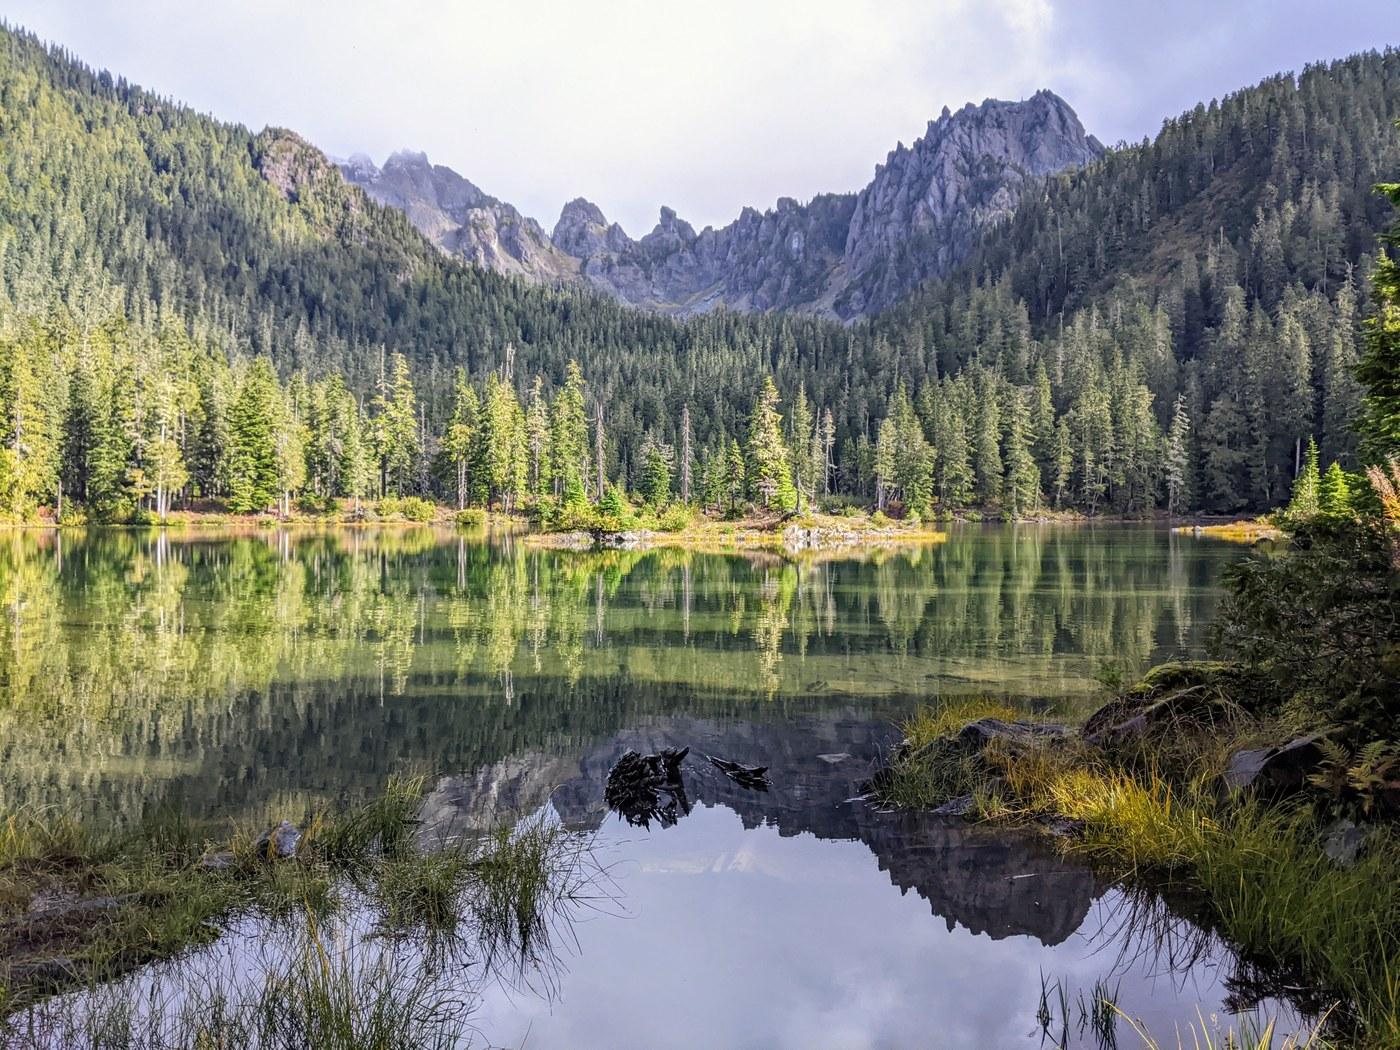 A aquamarine lake ringed by trees and rocks.